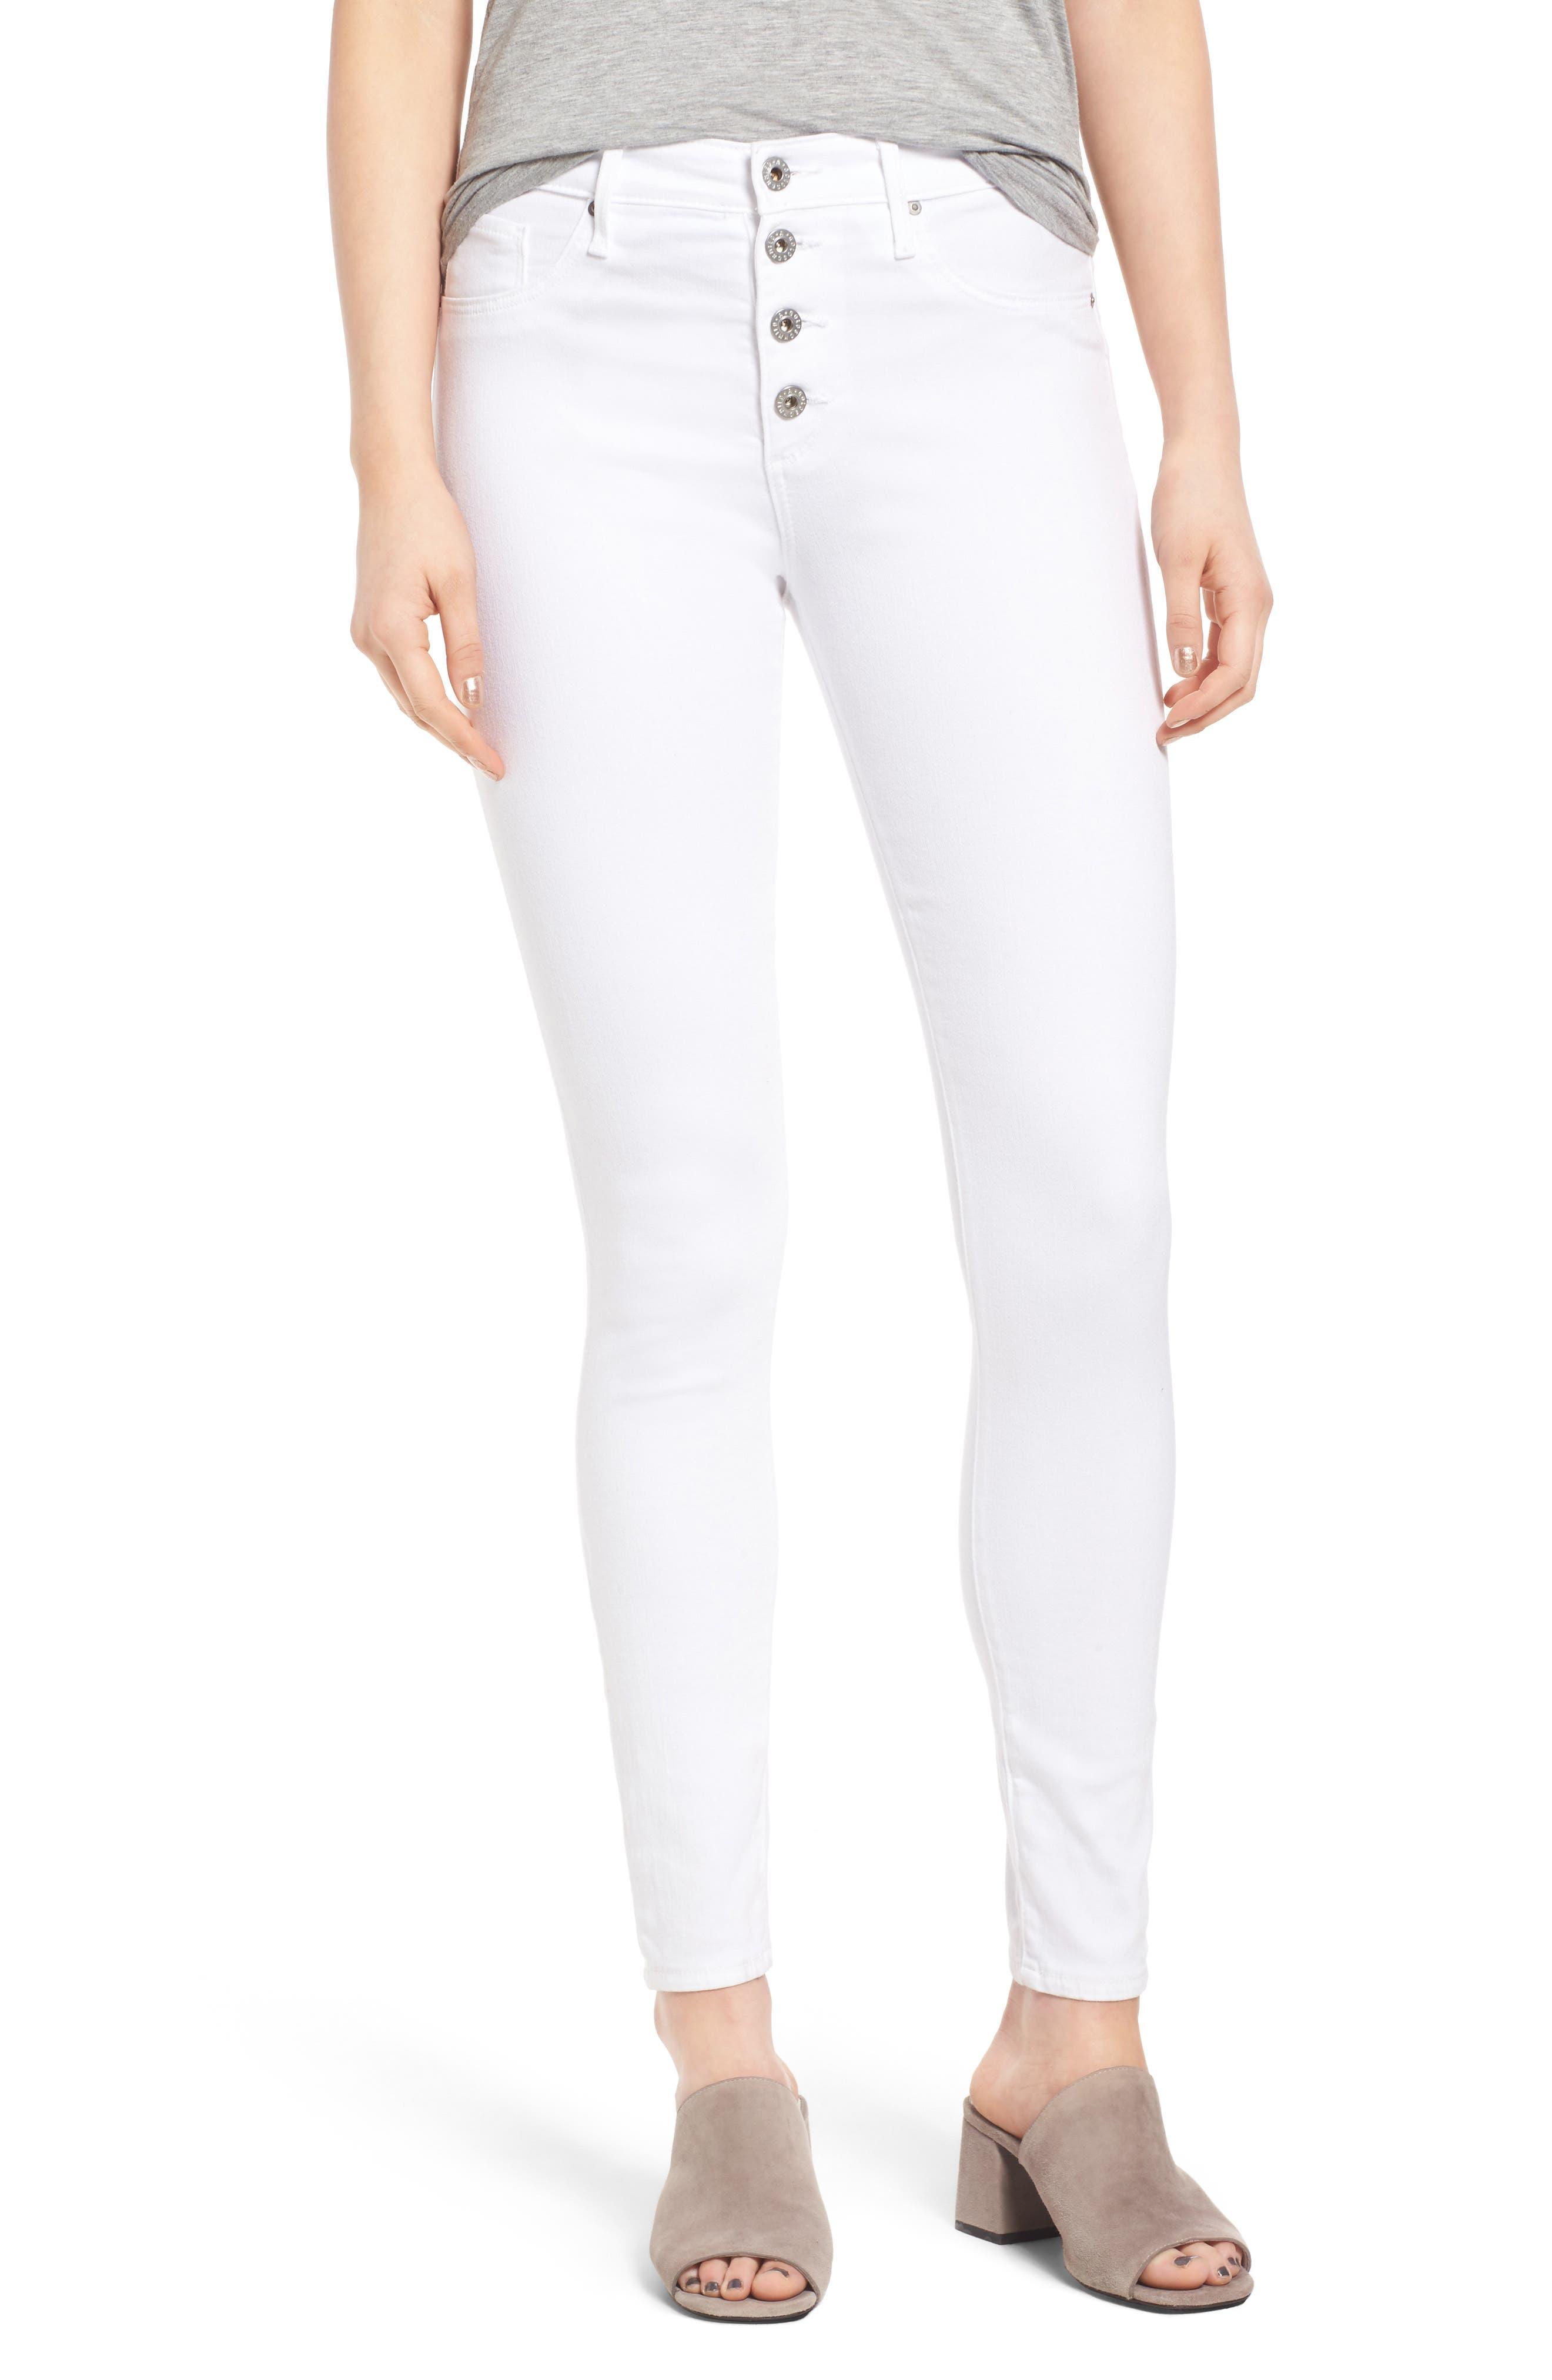 AG High-Waisted Jeans for Women | Nordstrom